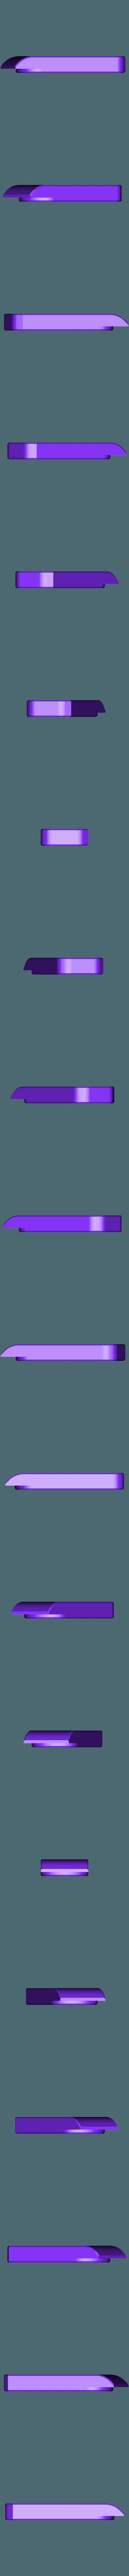 clampstep.stl Download free STL file CNC 3018 Clamp set • 3D printing object, Sagittario